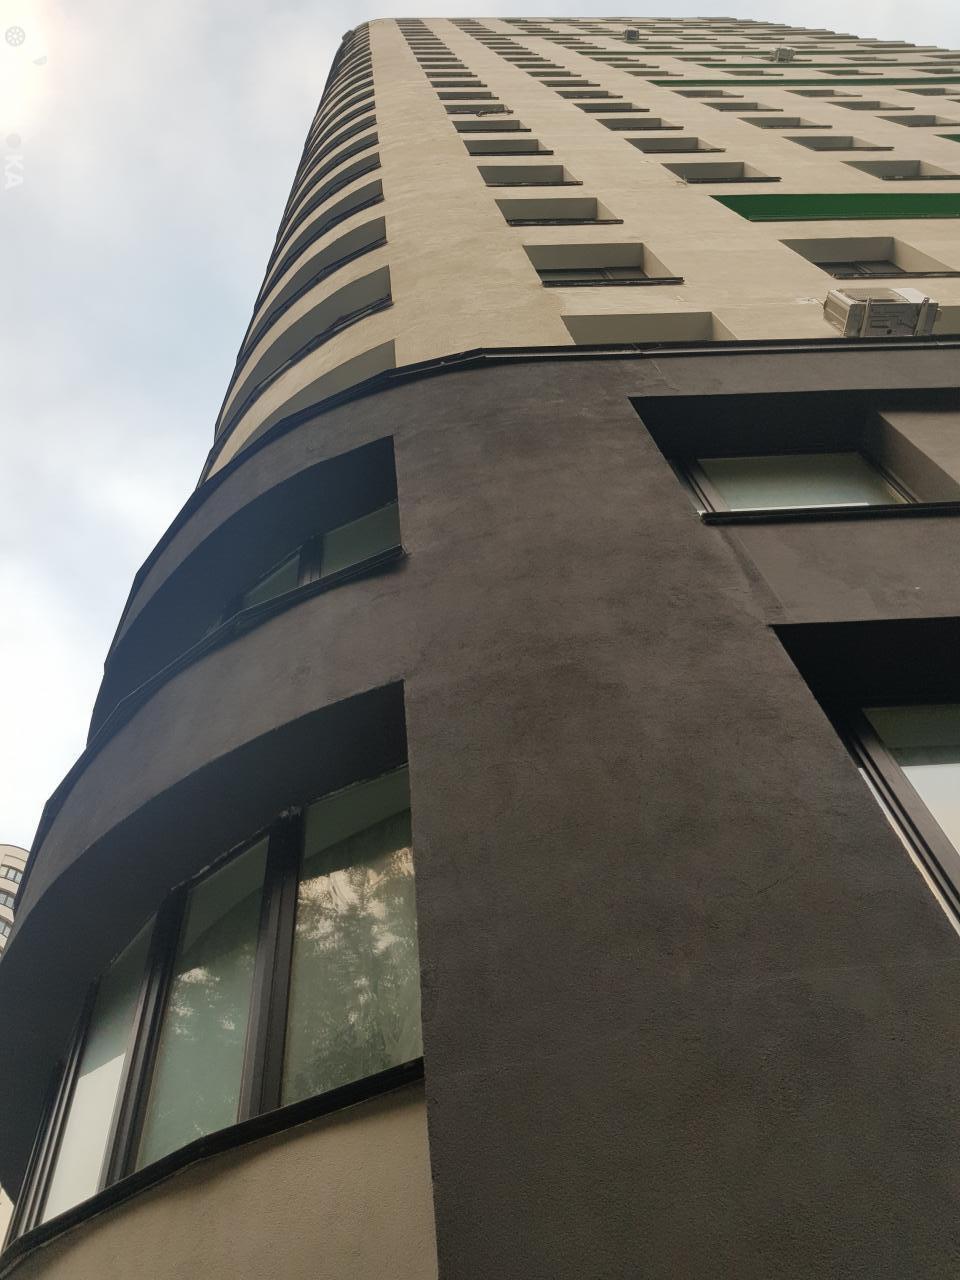 Продаётся 3-комнатная квартира 56.5 кв.м. этаж 18/24 за 6 450 000 руб